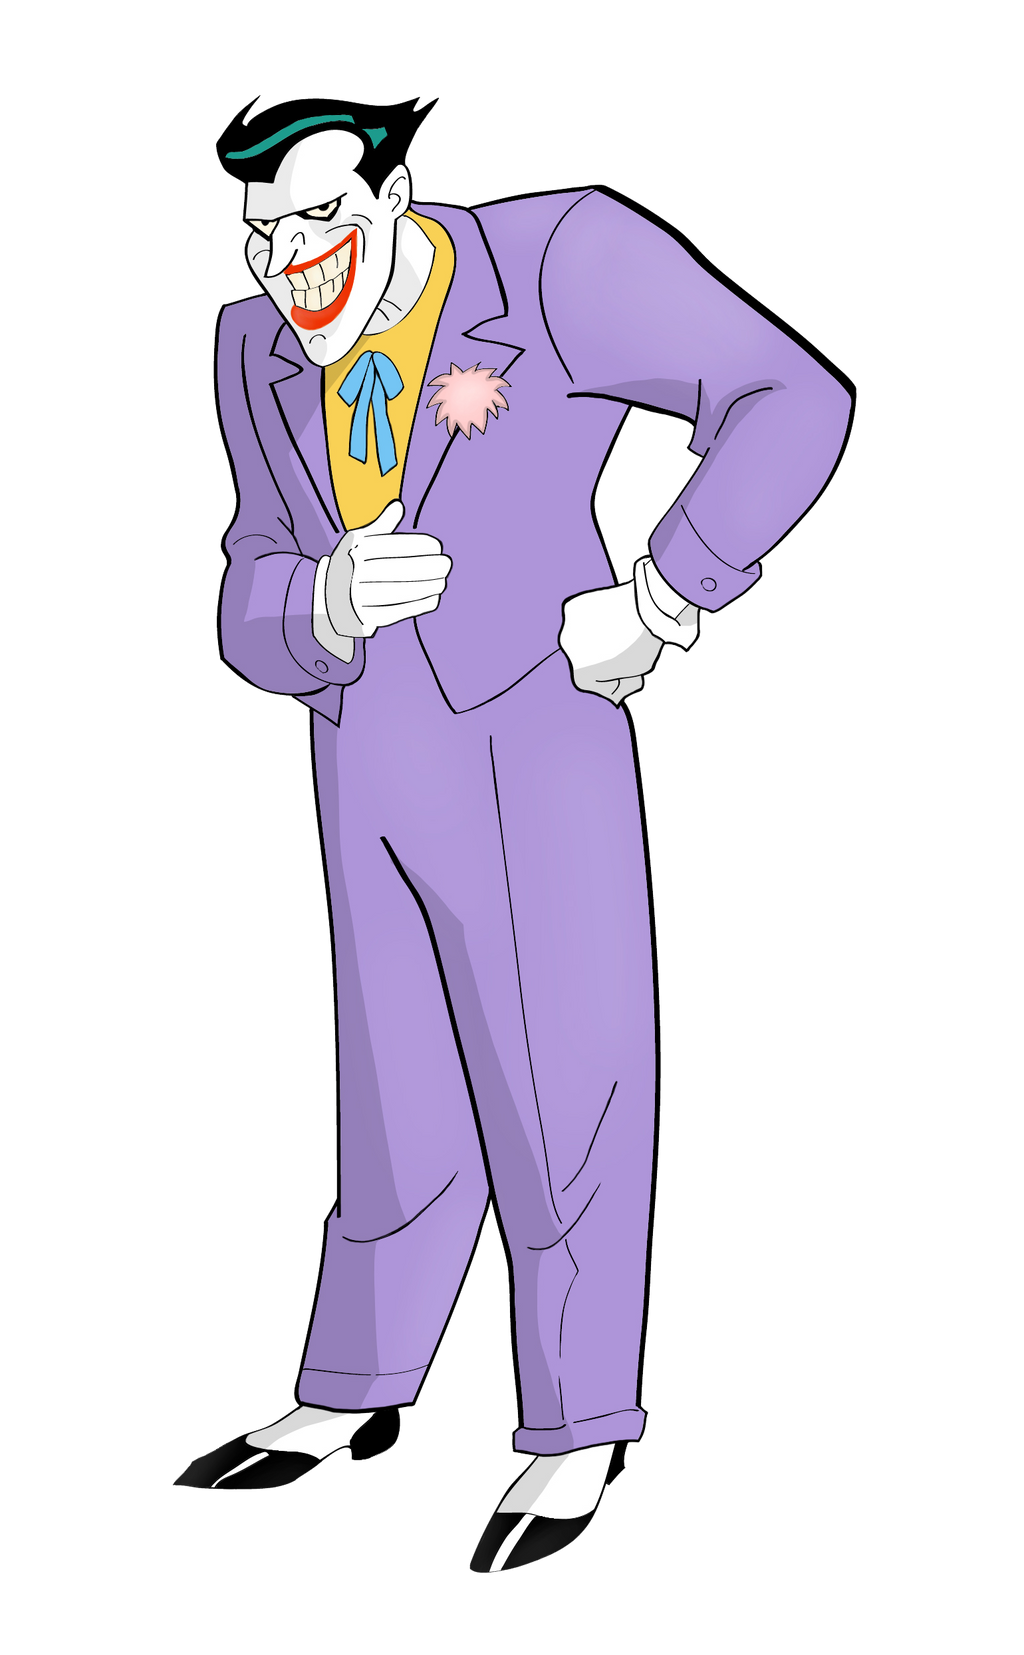 The Joker by DawidARTe on DeviantArt